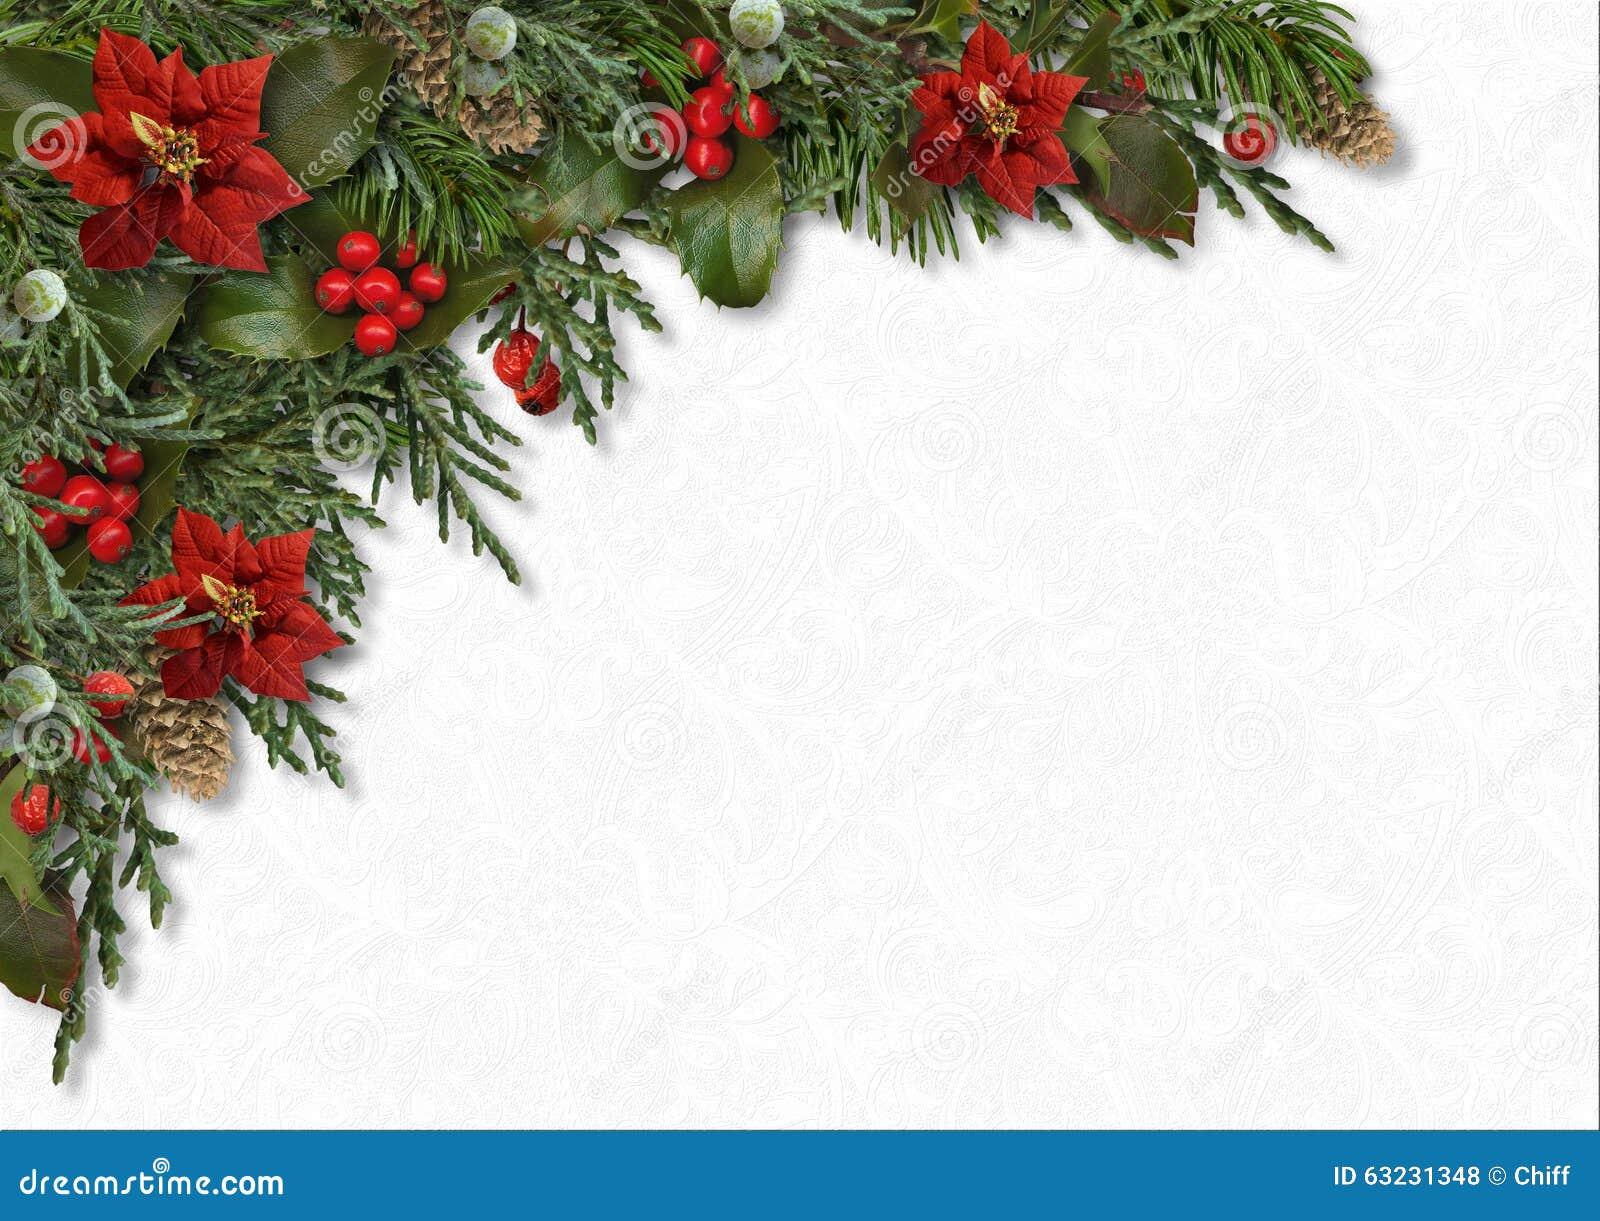 Christmas Border Of Hollypoinsettia Mistletoe Fir Treecones Stock